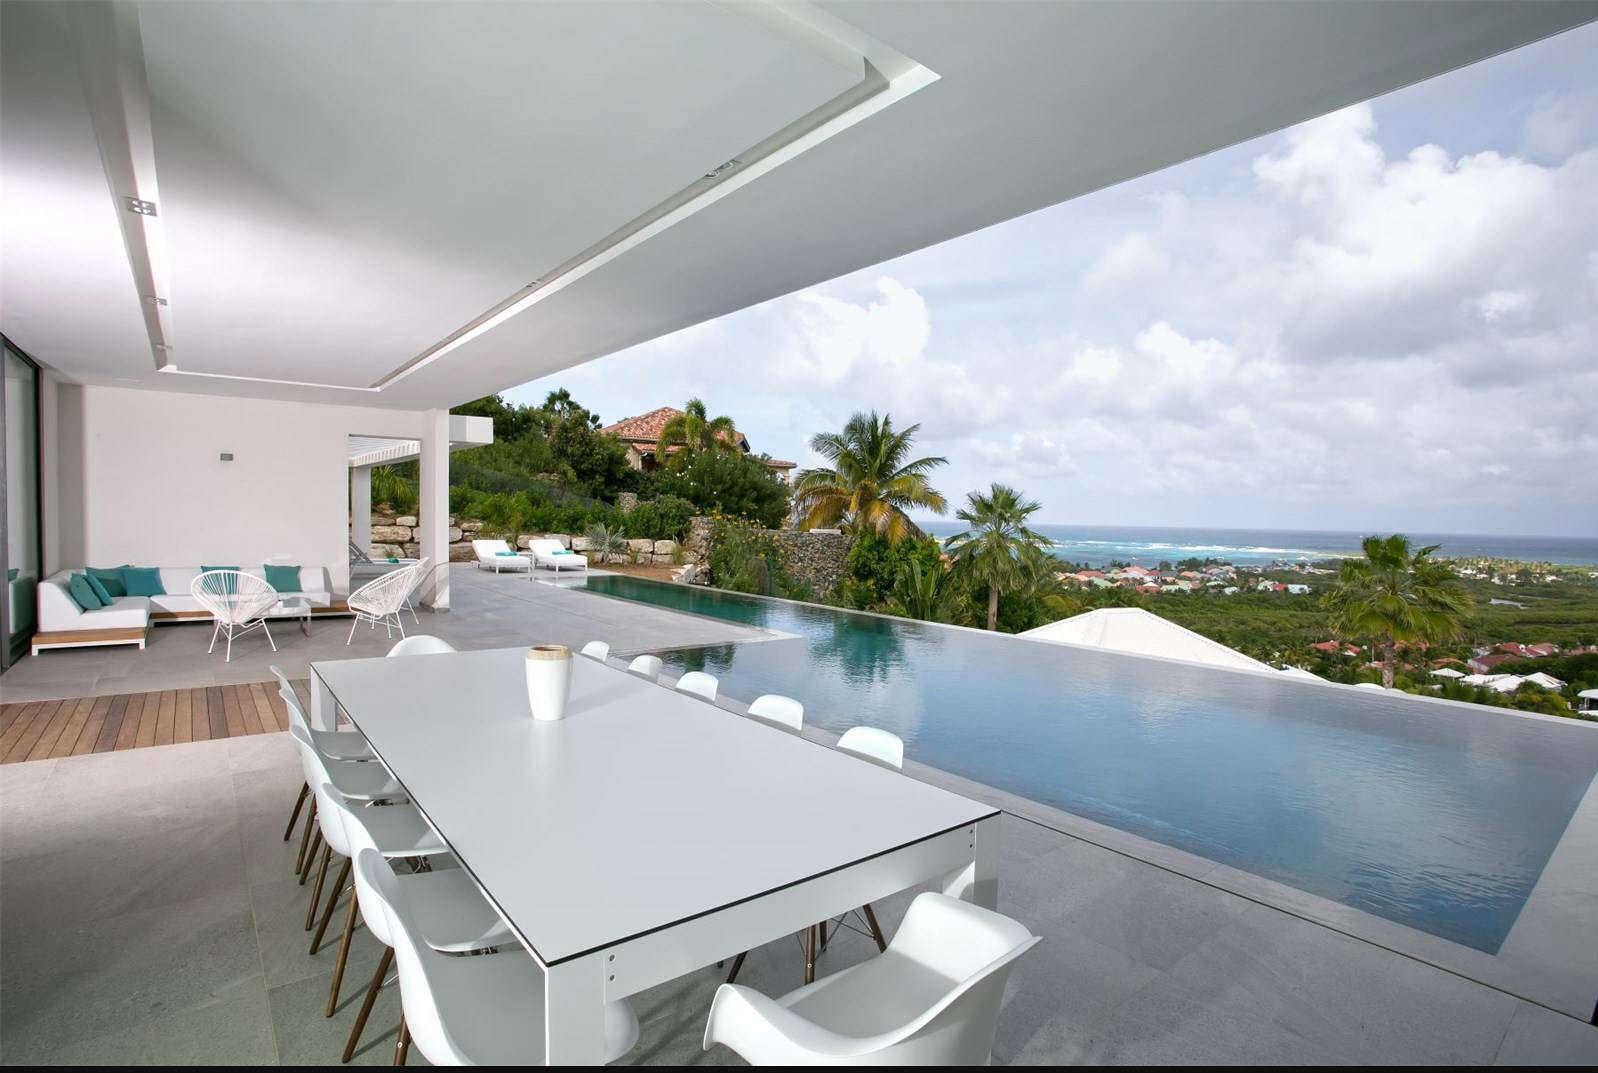 Luxury villa rentals caribbean - St martin - Saint martin french - Orient bay - Villa O - Image 1/14